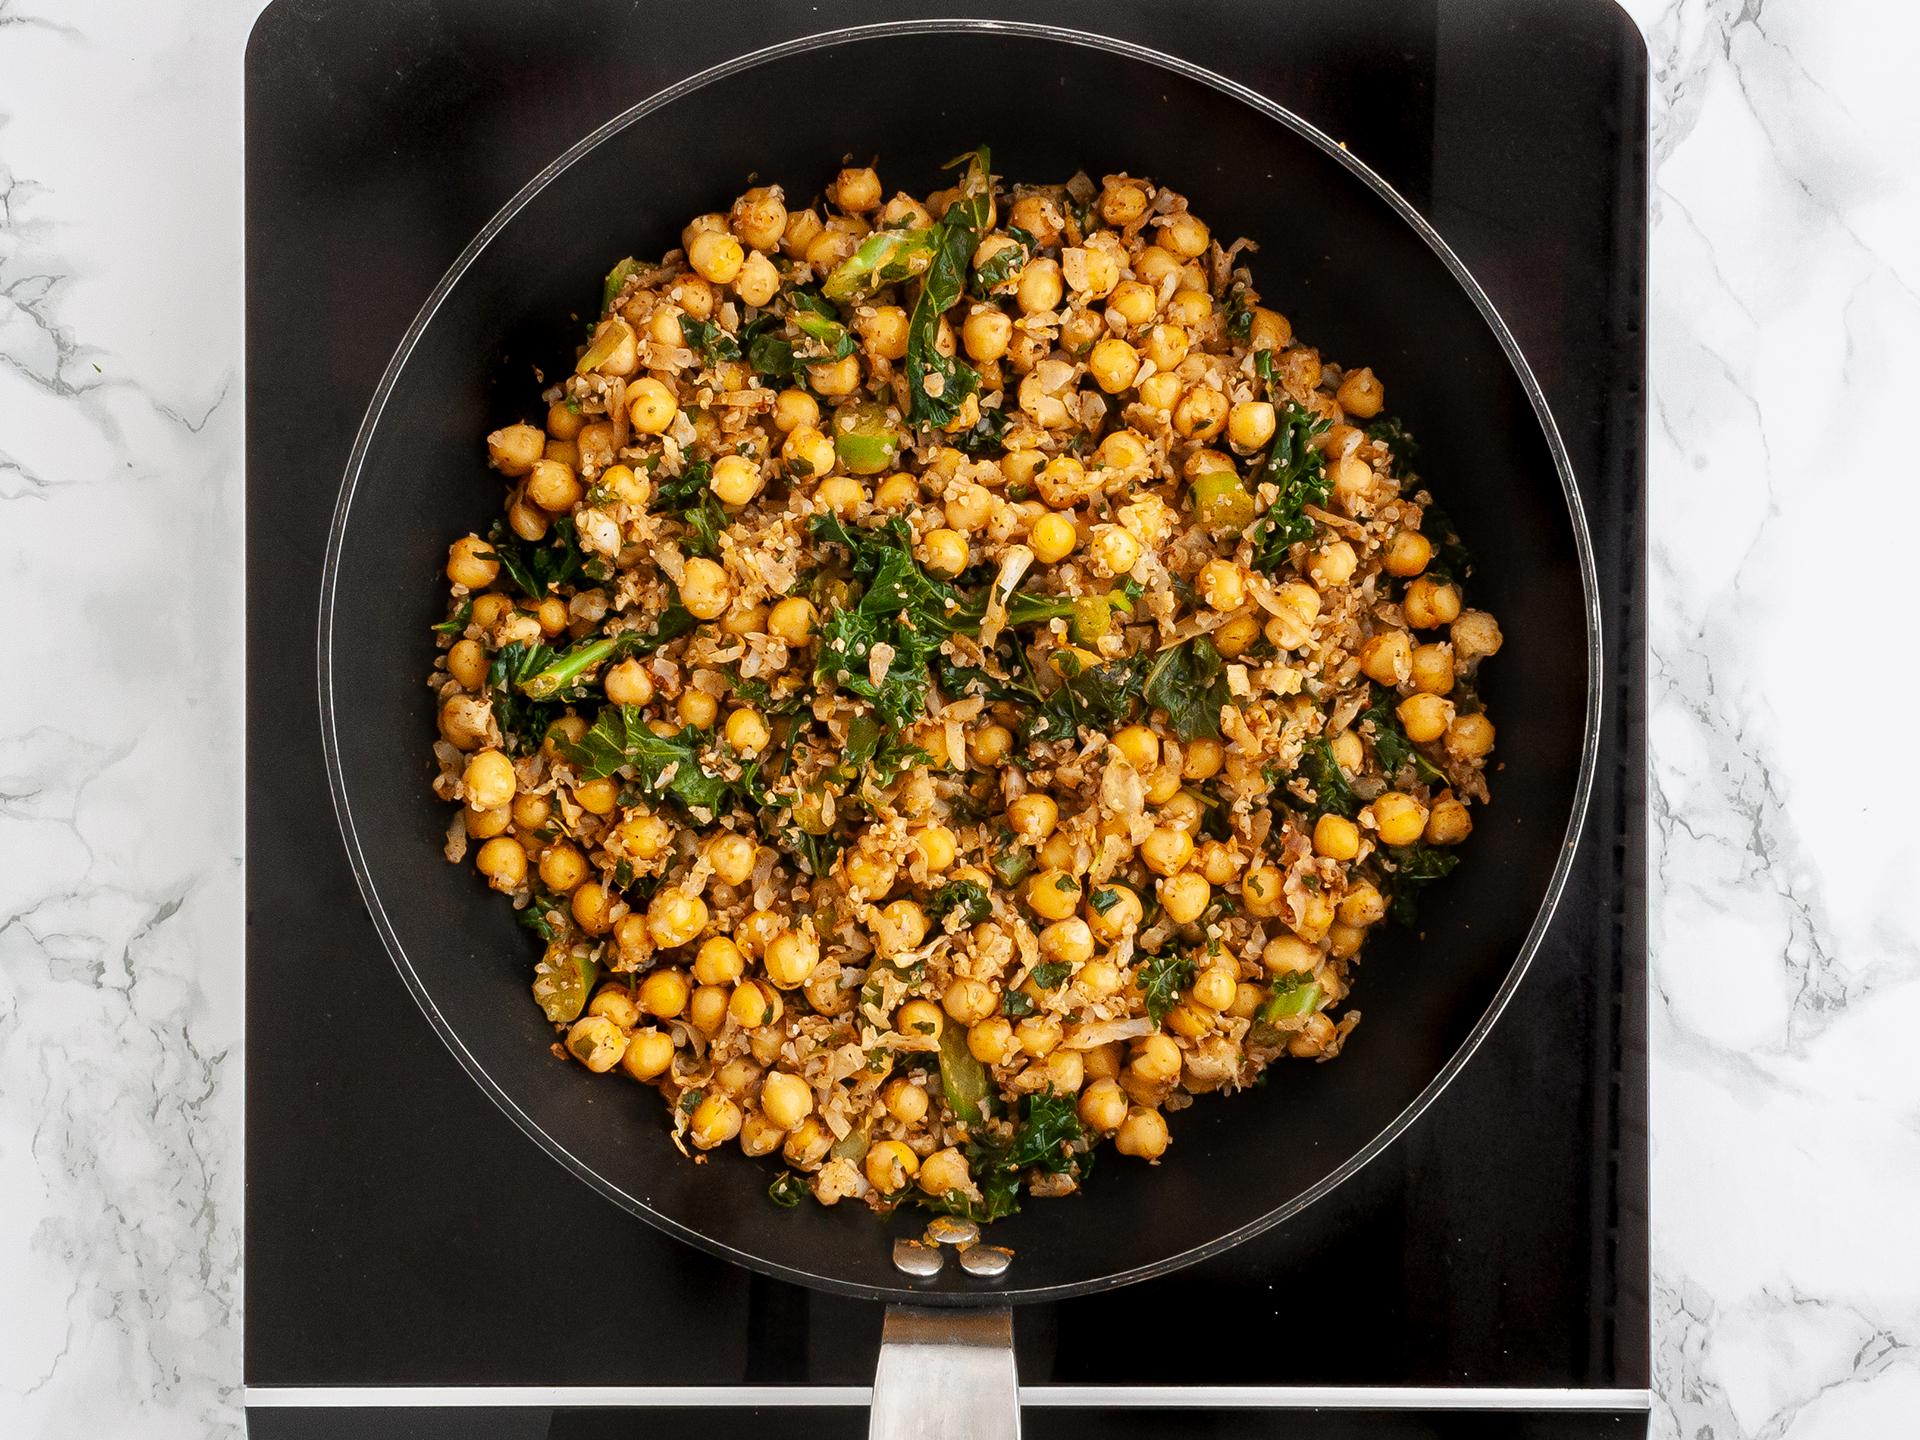 Step 2.1 of Moroccan Cauliflower Rice Recipe